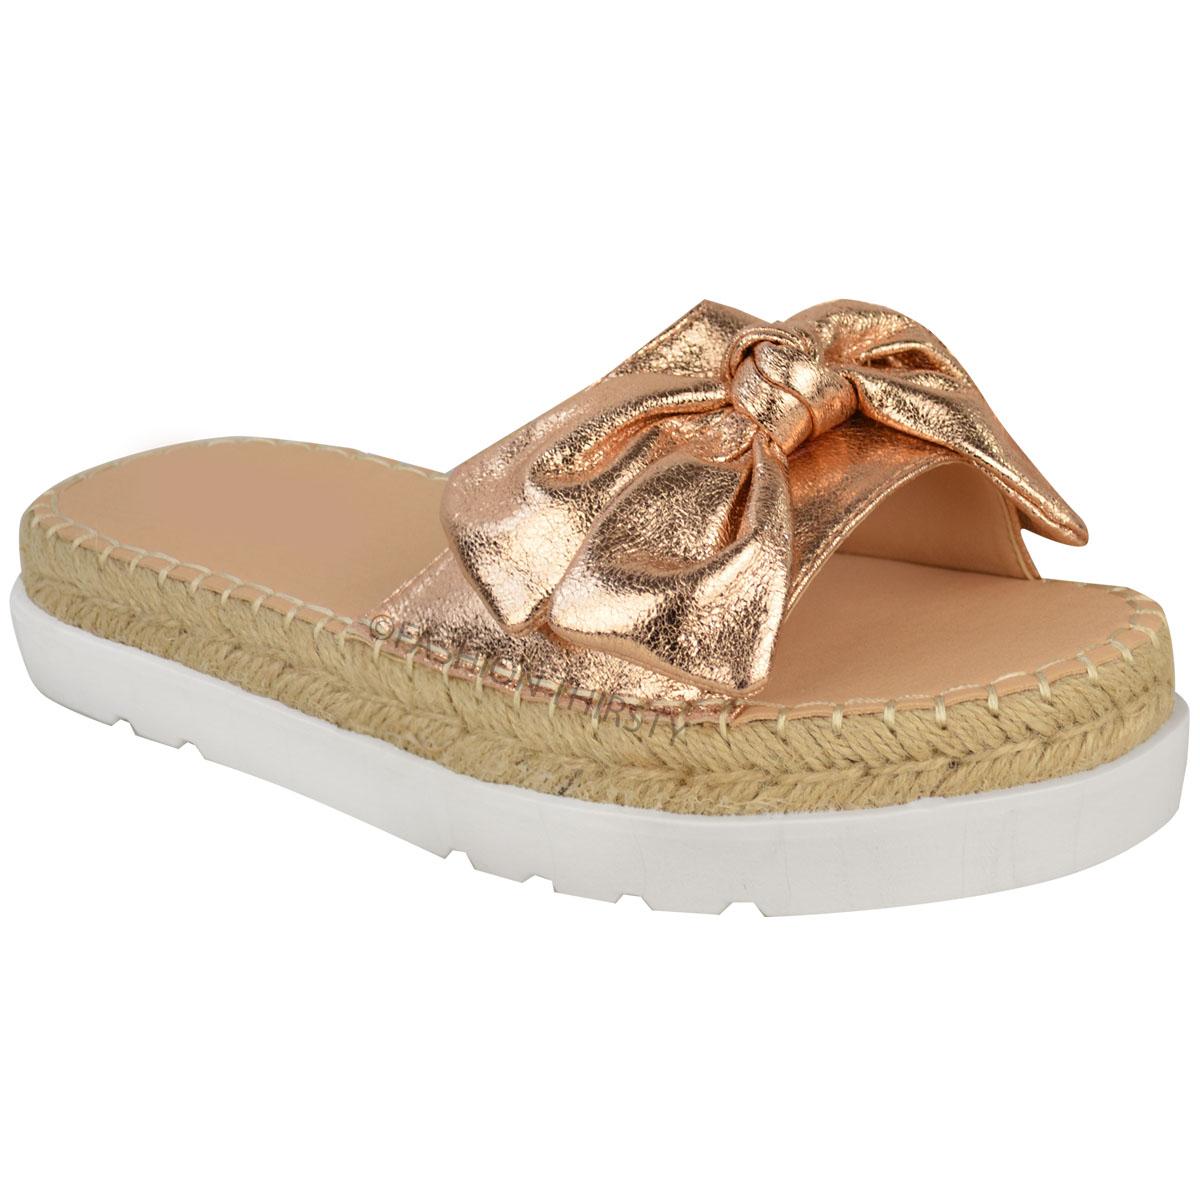 Womens Ladies Flatform Sandals Wedge Slip On Summer Shoes Holiday ...